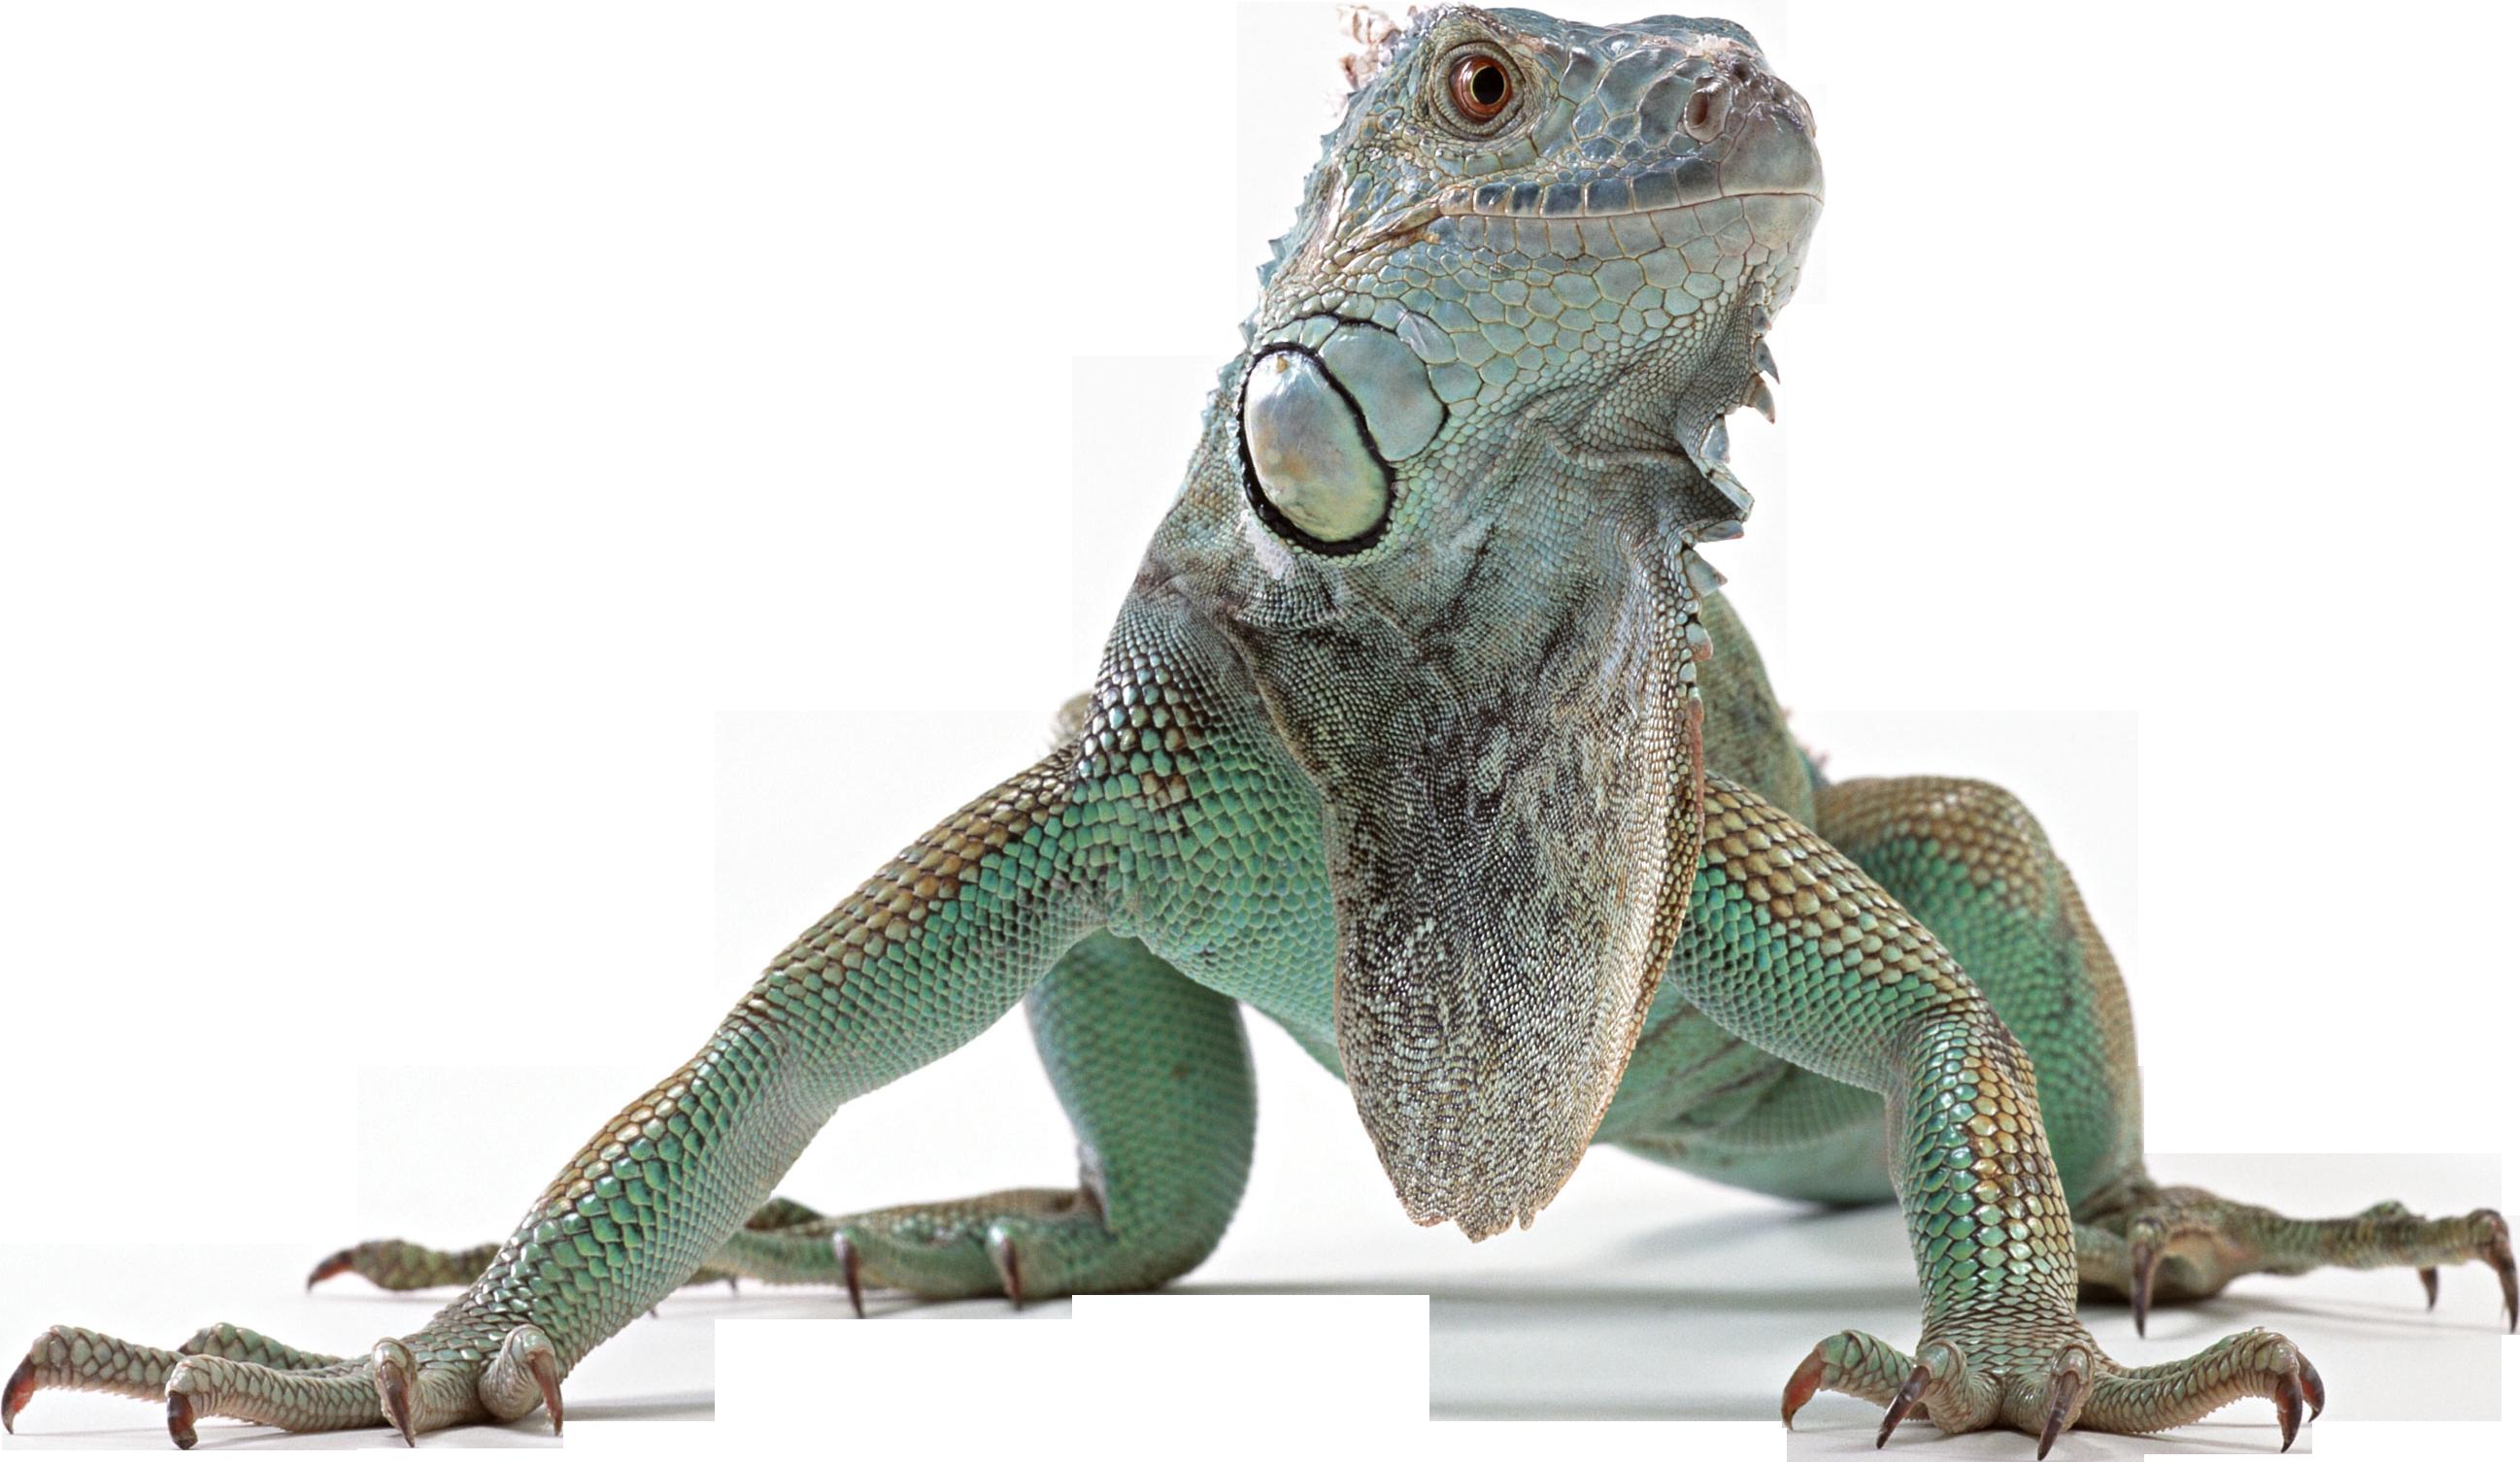 Lizard clipart iguana. Png web icons